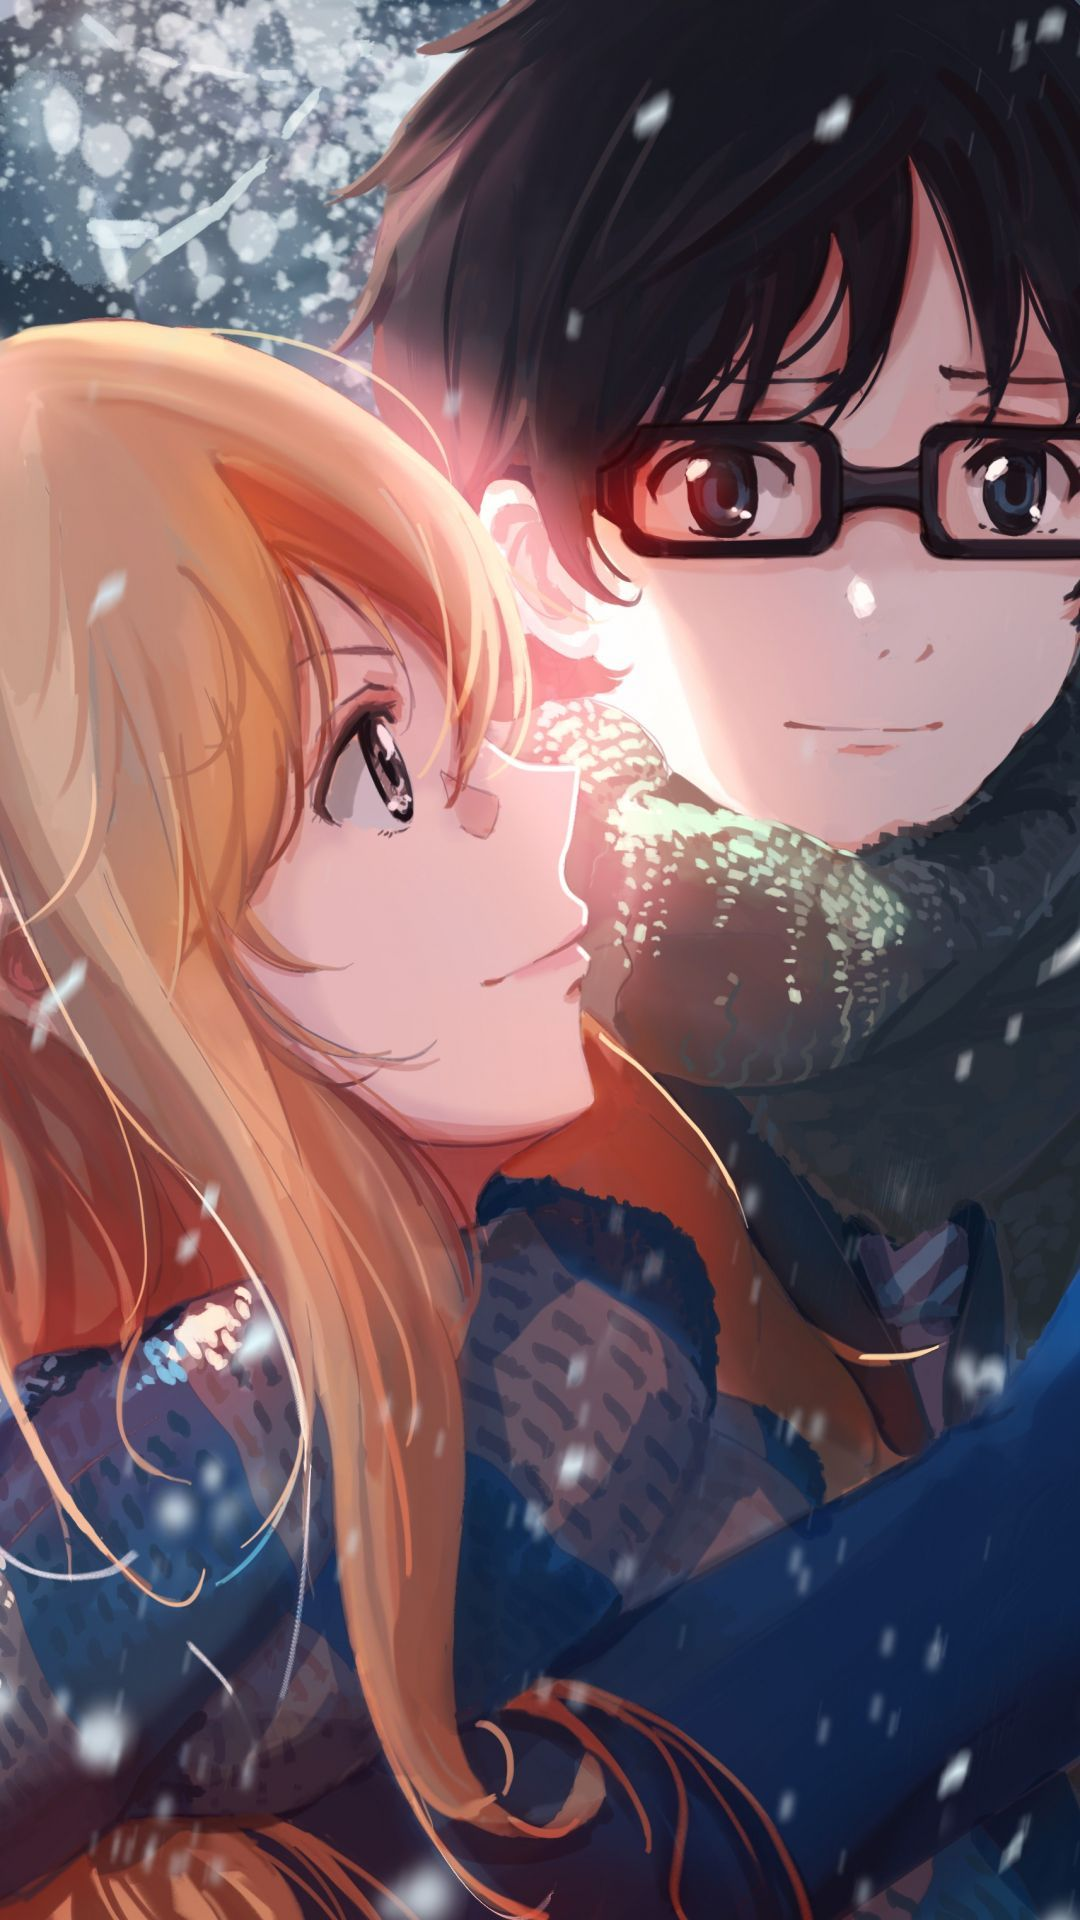 Fondos De Pantalla Anime 2 Cerrado Anime Love Your Lie In April Shigatsu Wa Kimi